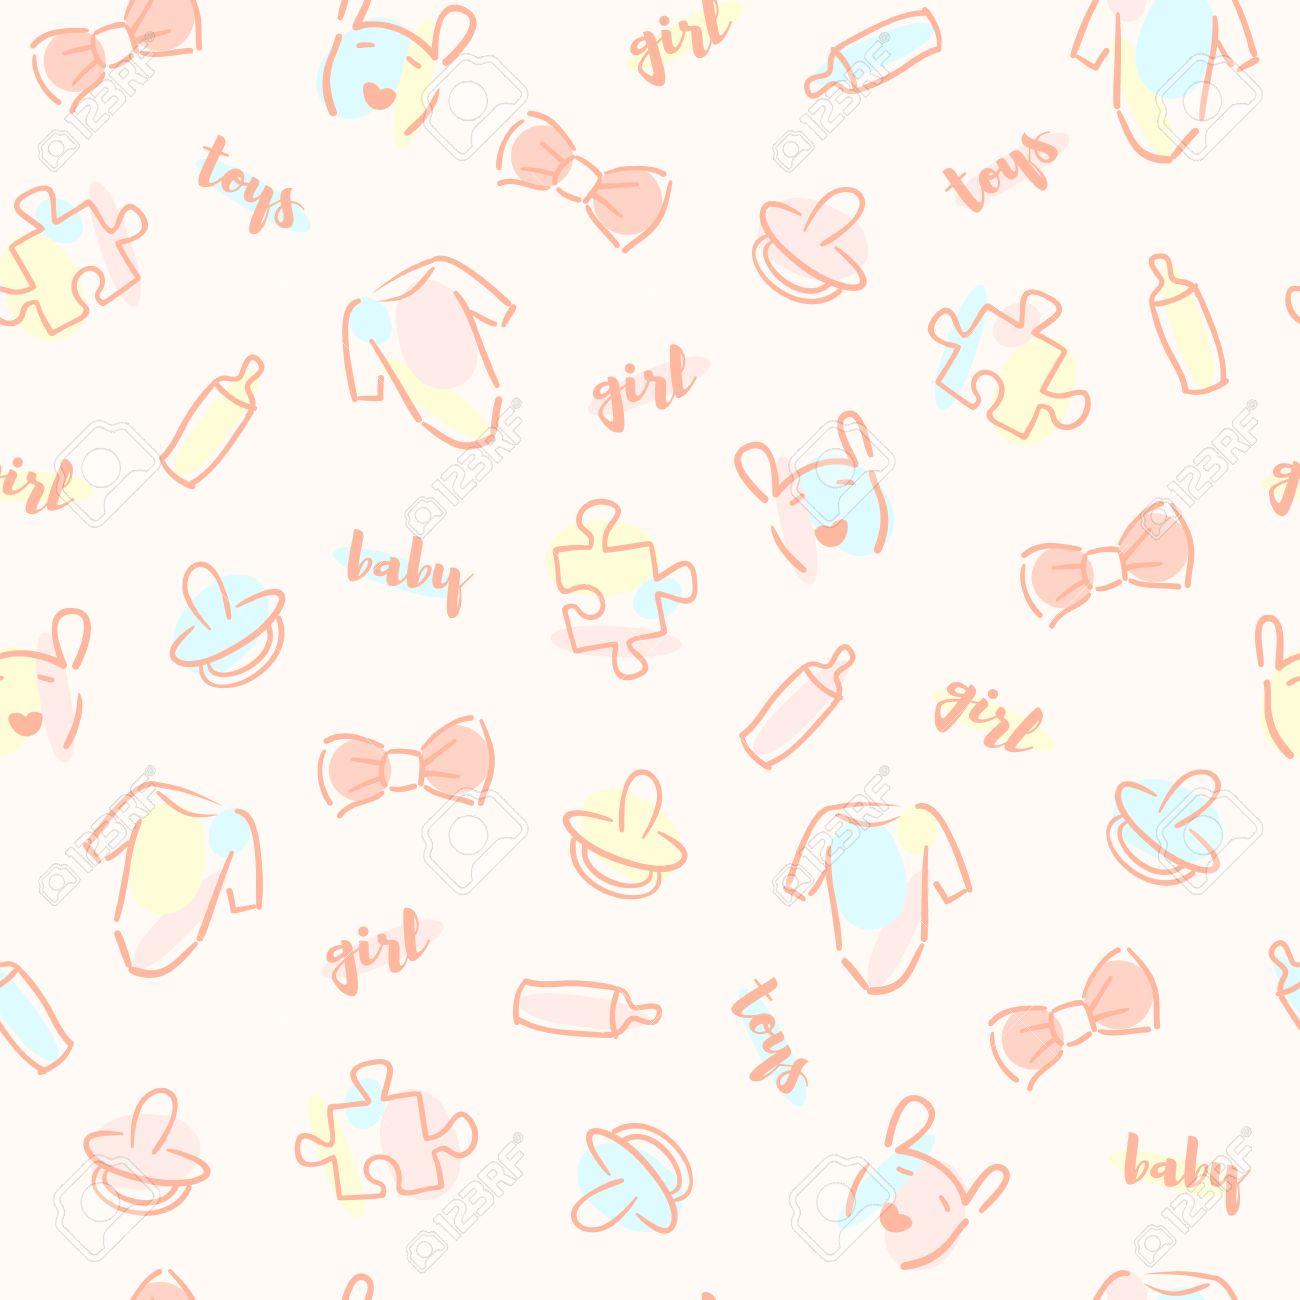 d3451da4c0d9 Vector Cute Baby Girl Seamless Pattern. Elegant Baby Background ...